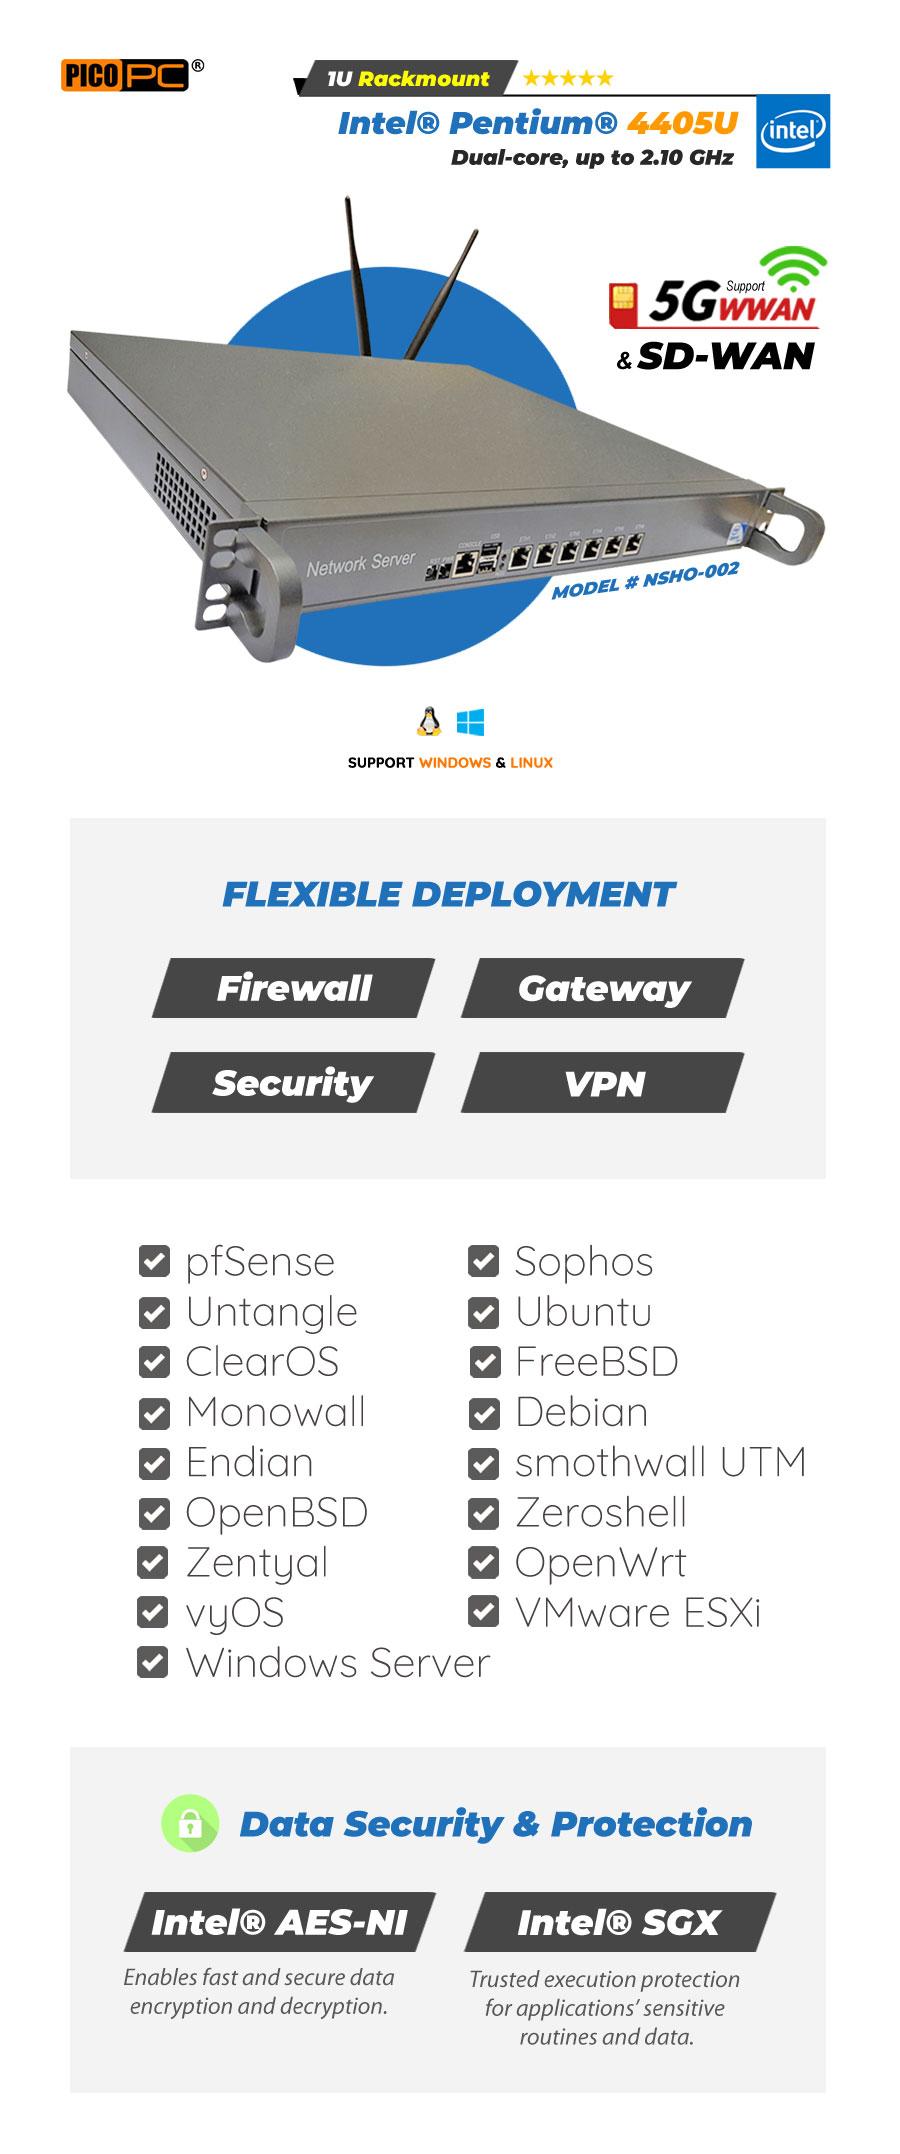 Intel 3855U 6 LAN 1 COM WiFi 4G Firewall 1U Rackmount Server - NSHO-002 | Image